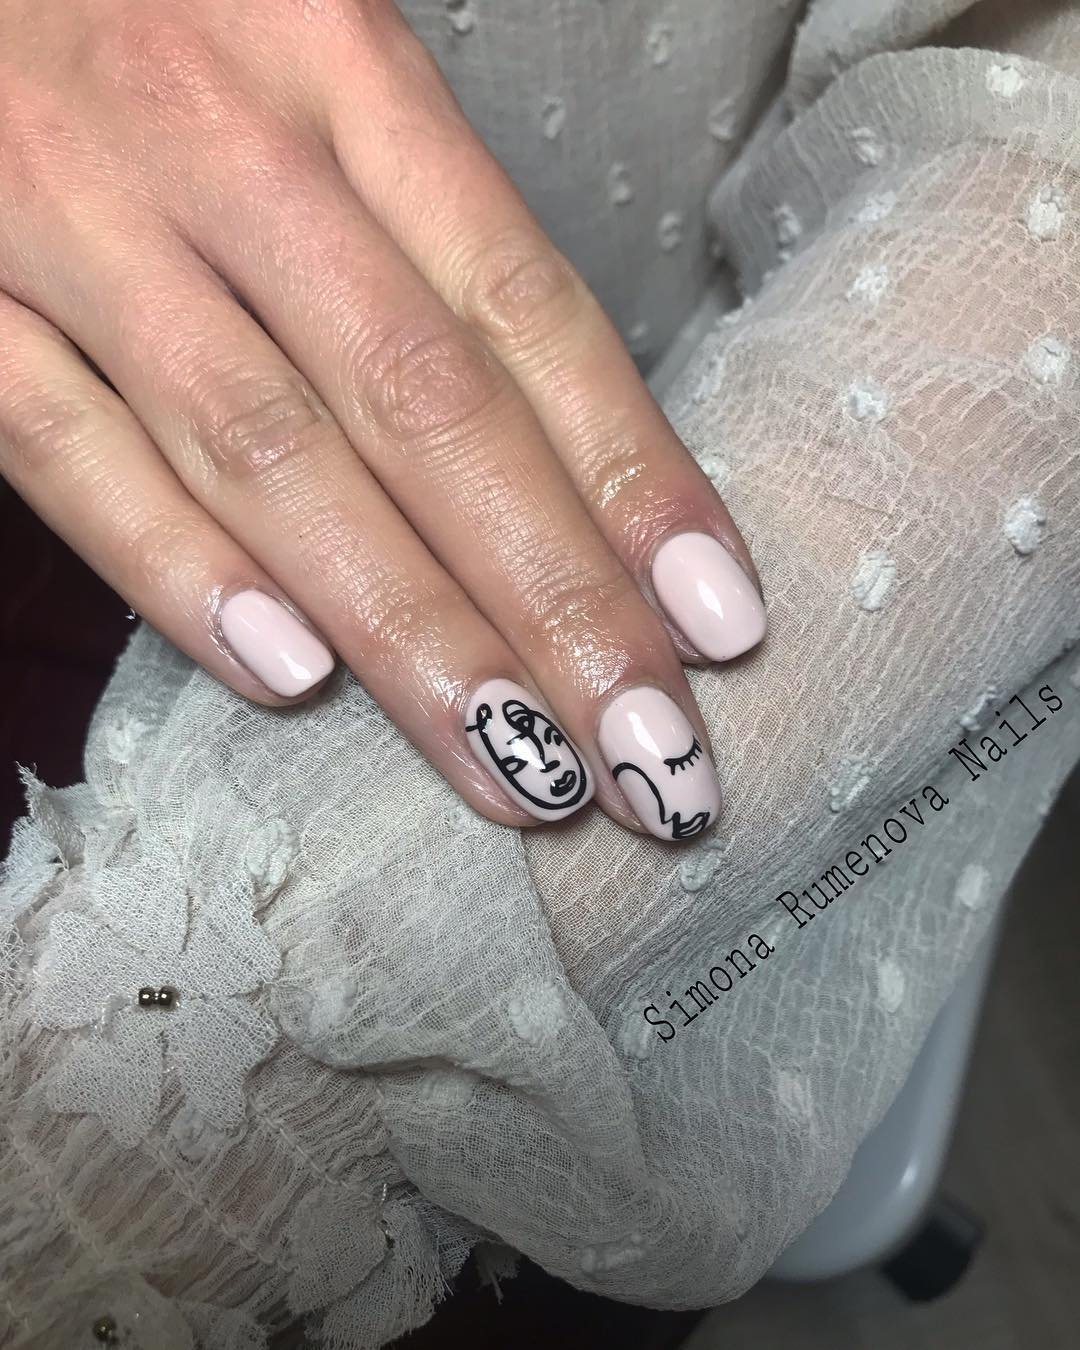 29 romantic nail designs ideas